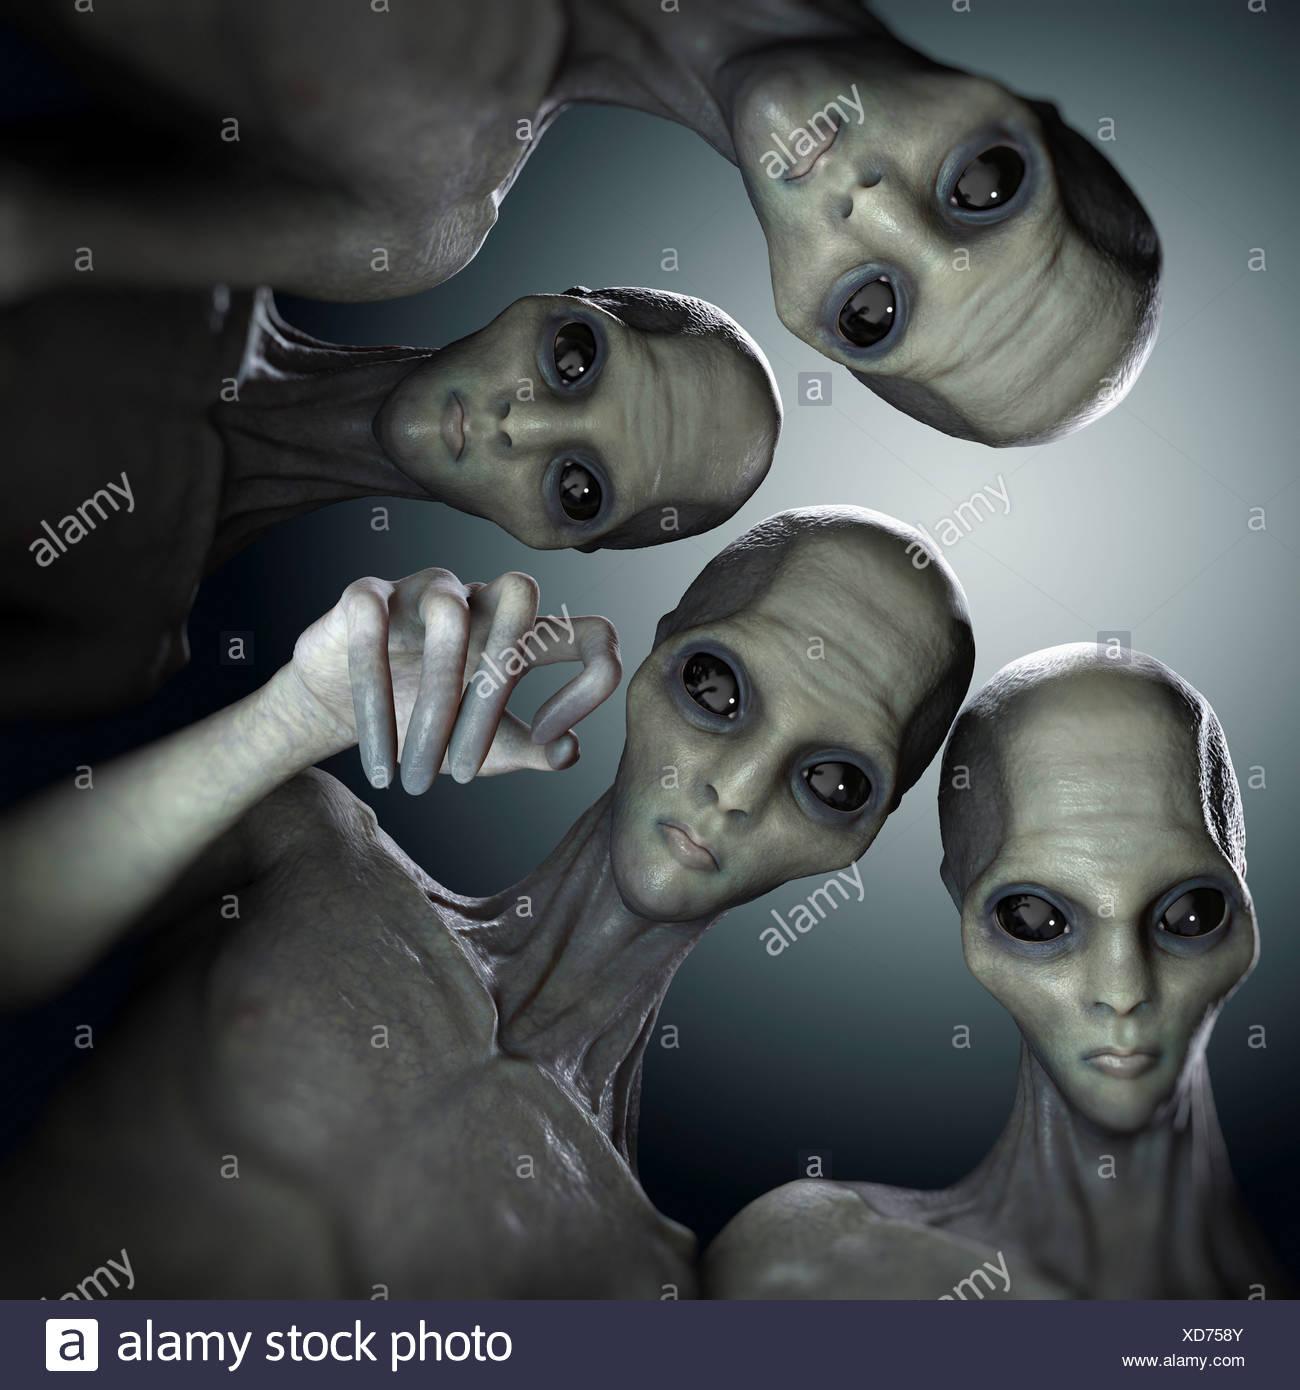 Alien Abduction - Stock Image